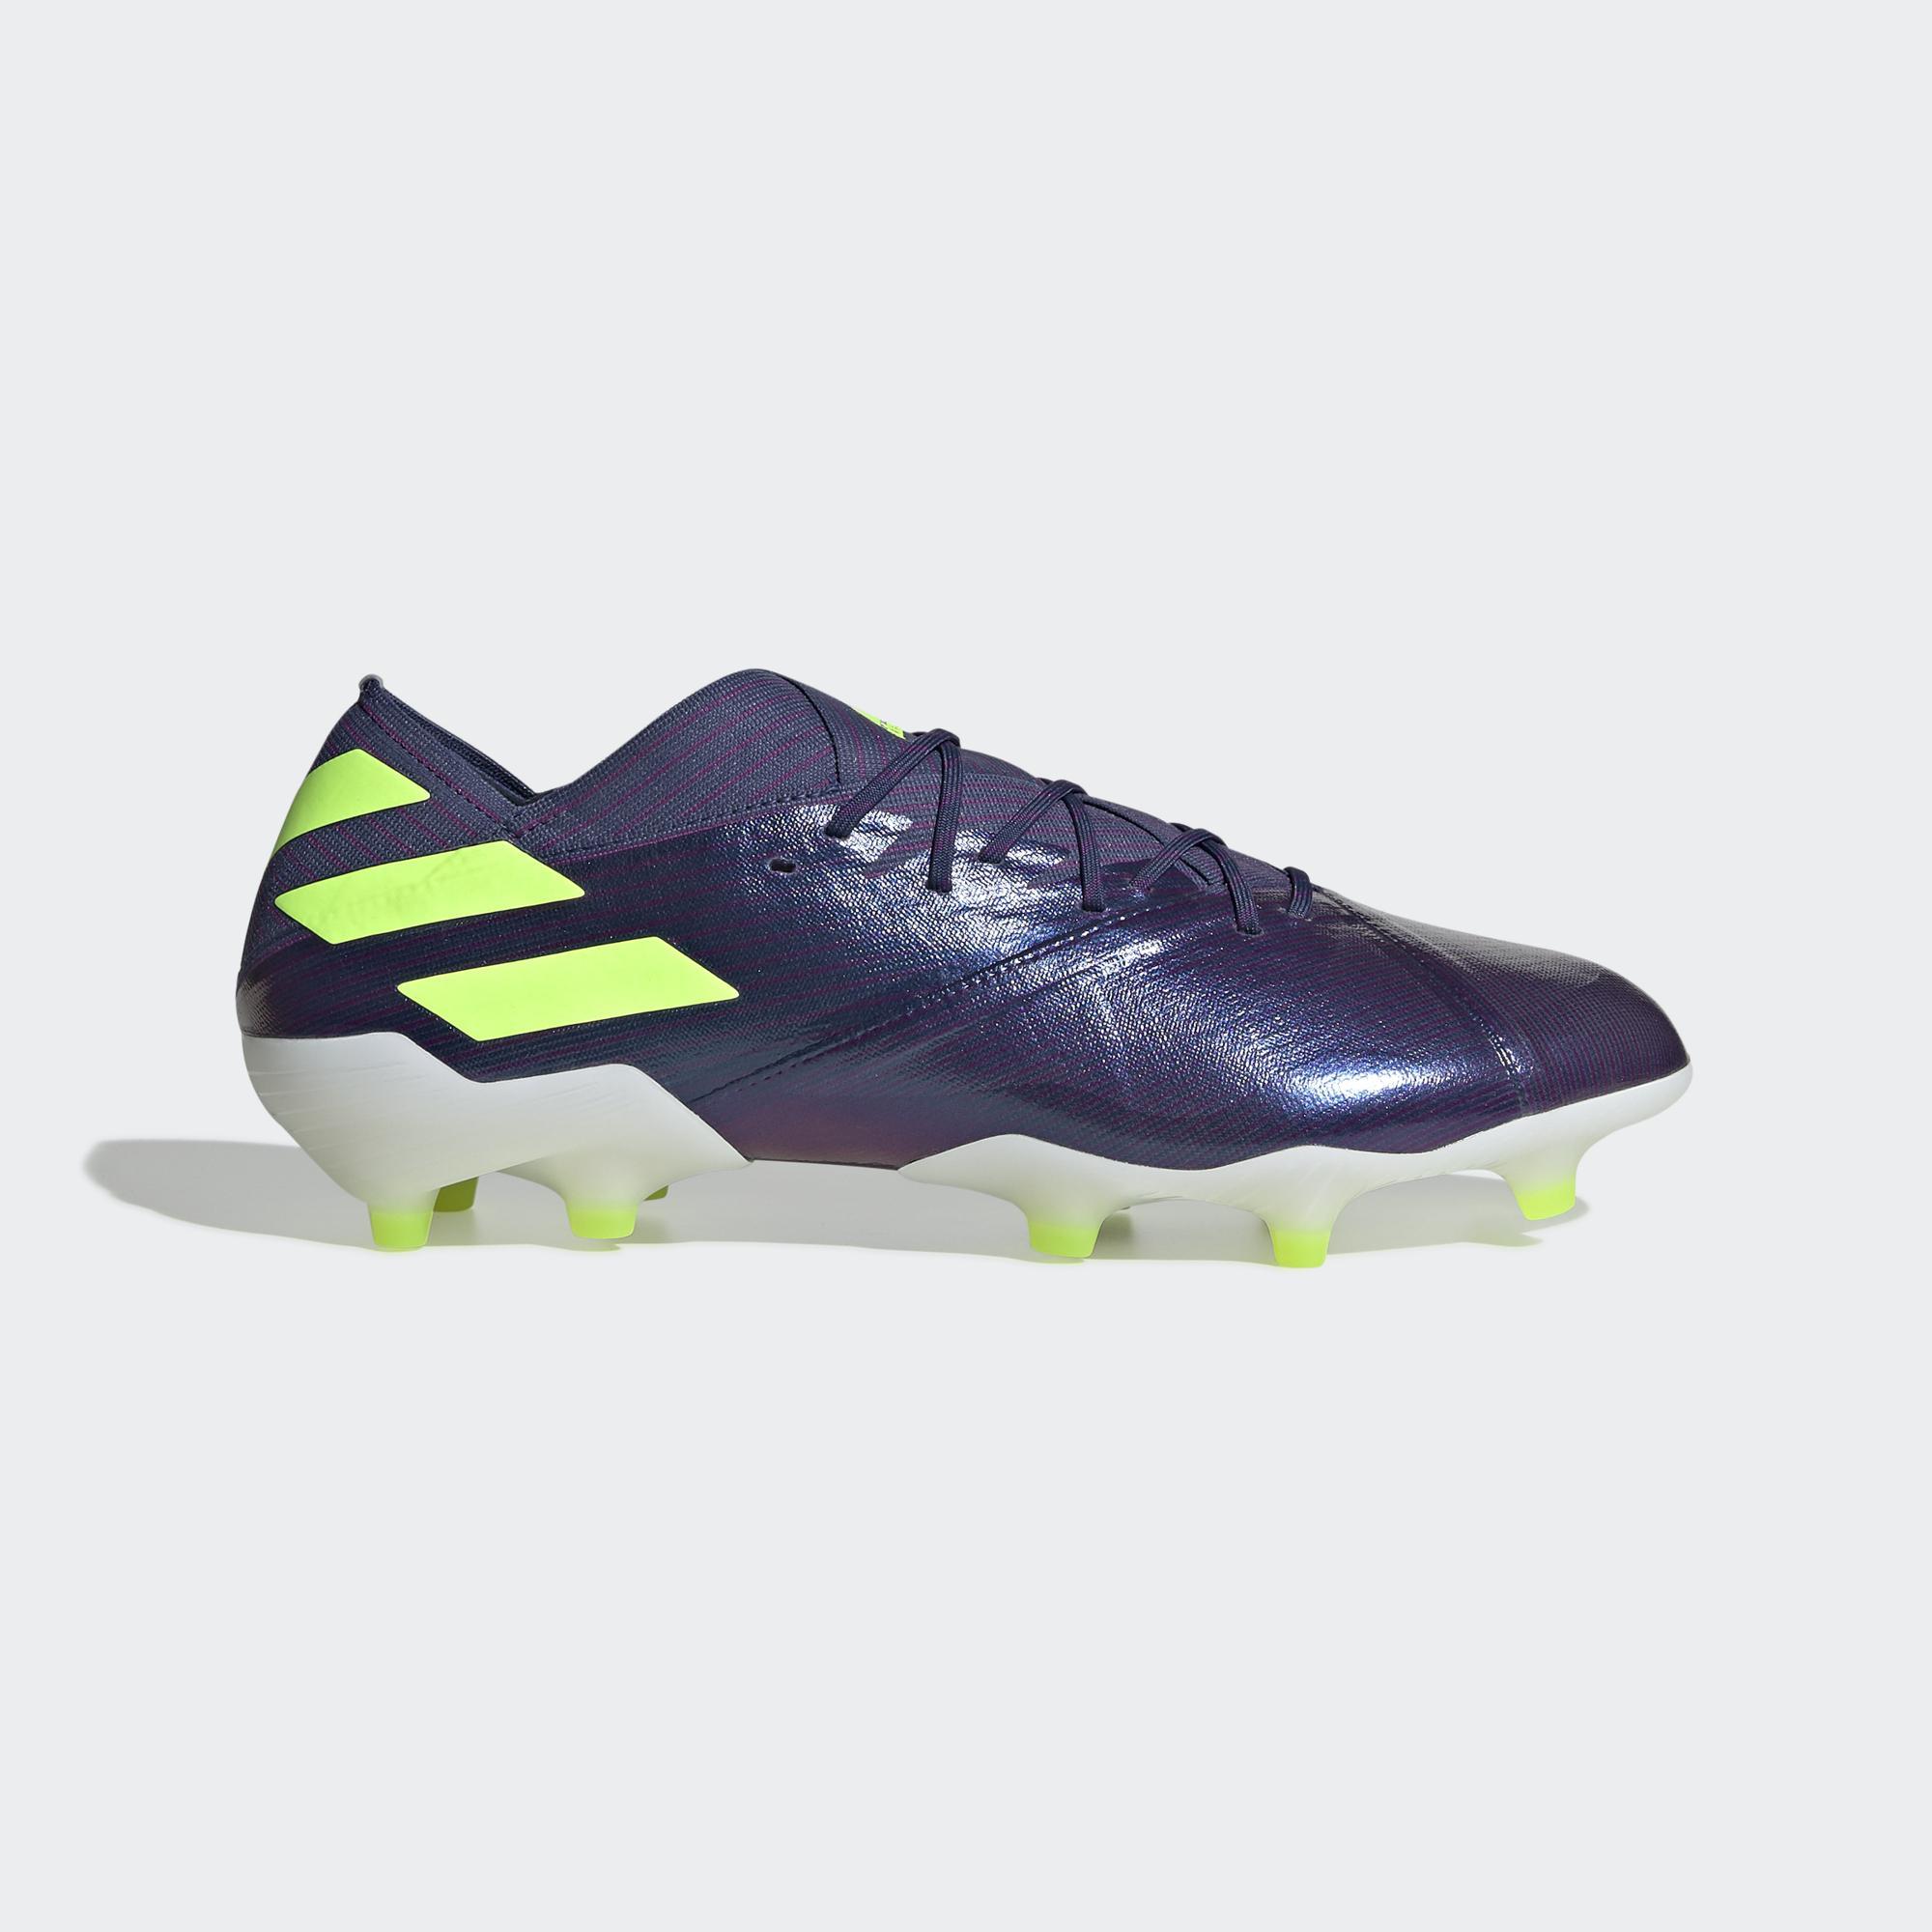 Adidas Scarpe Calcio Nemeziz Messi 19.1 Fg